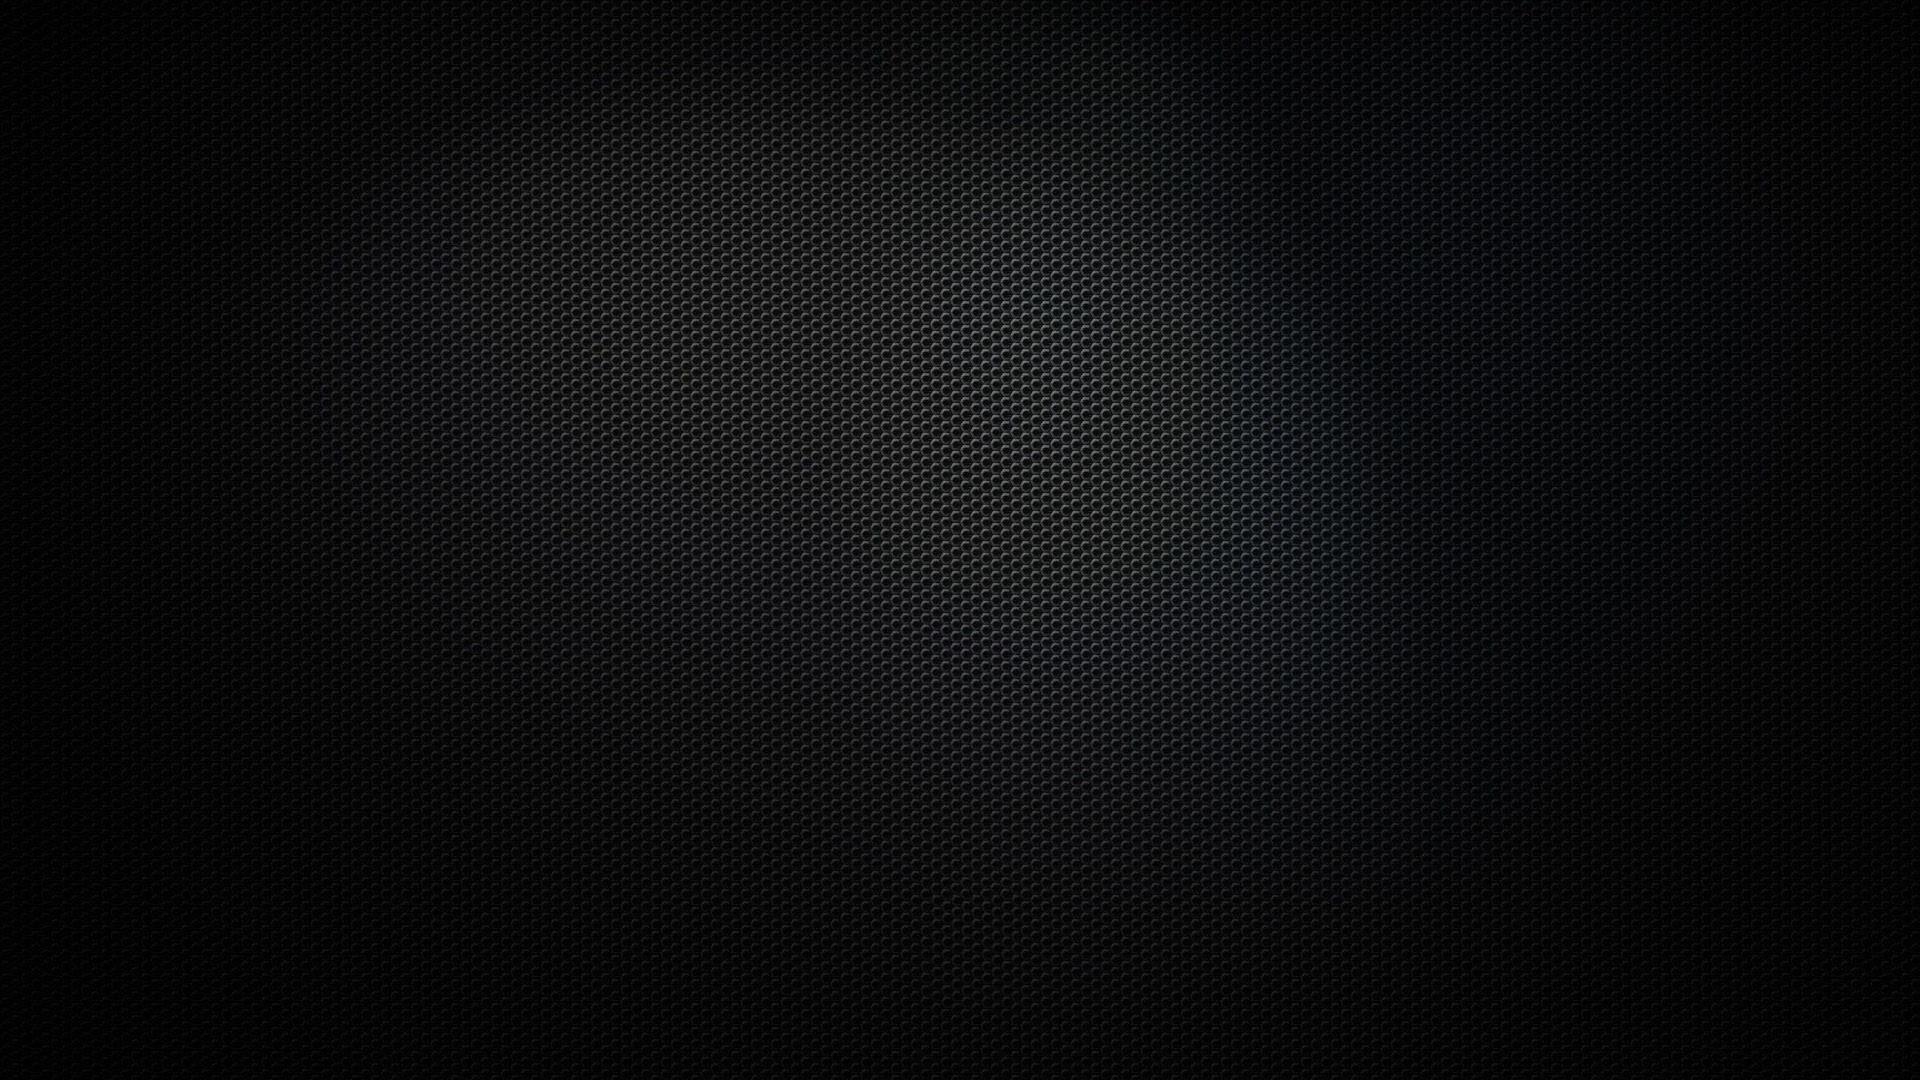 black desktop wallpapers dark background 63 images